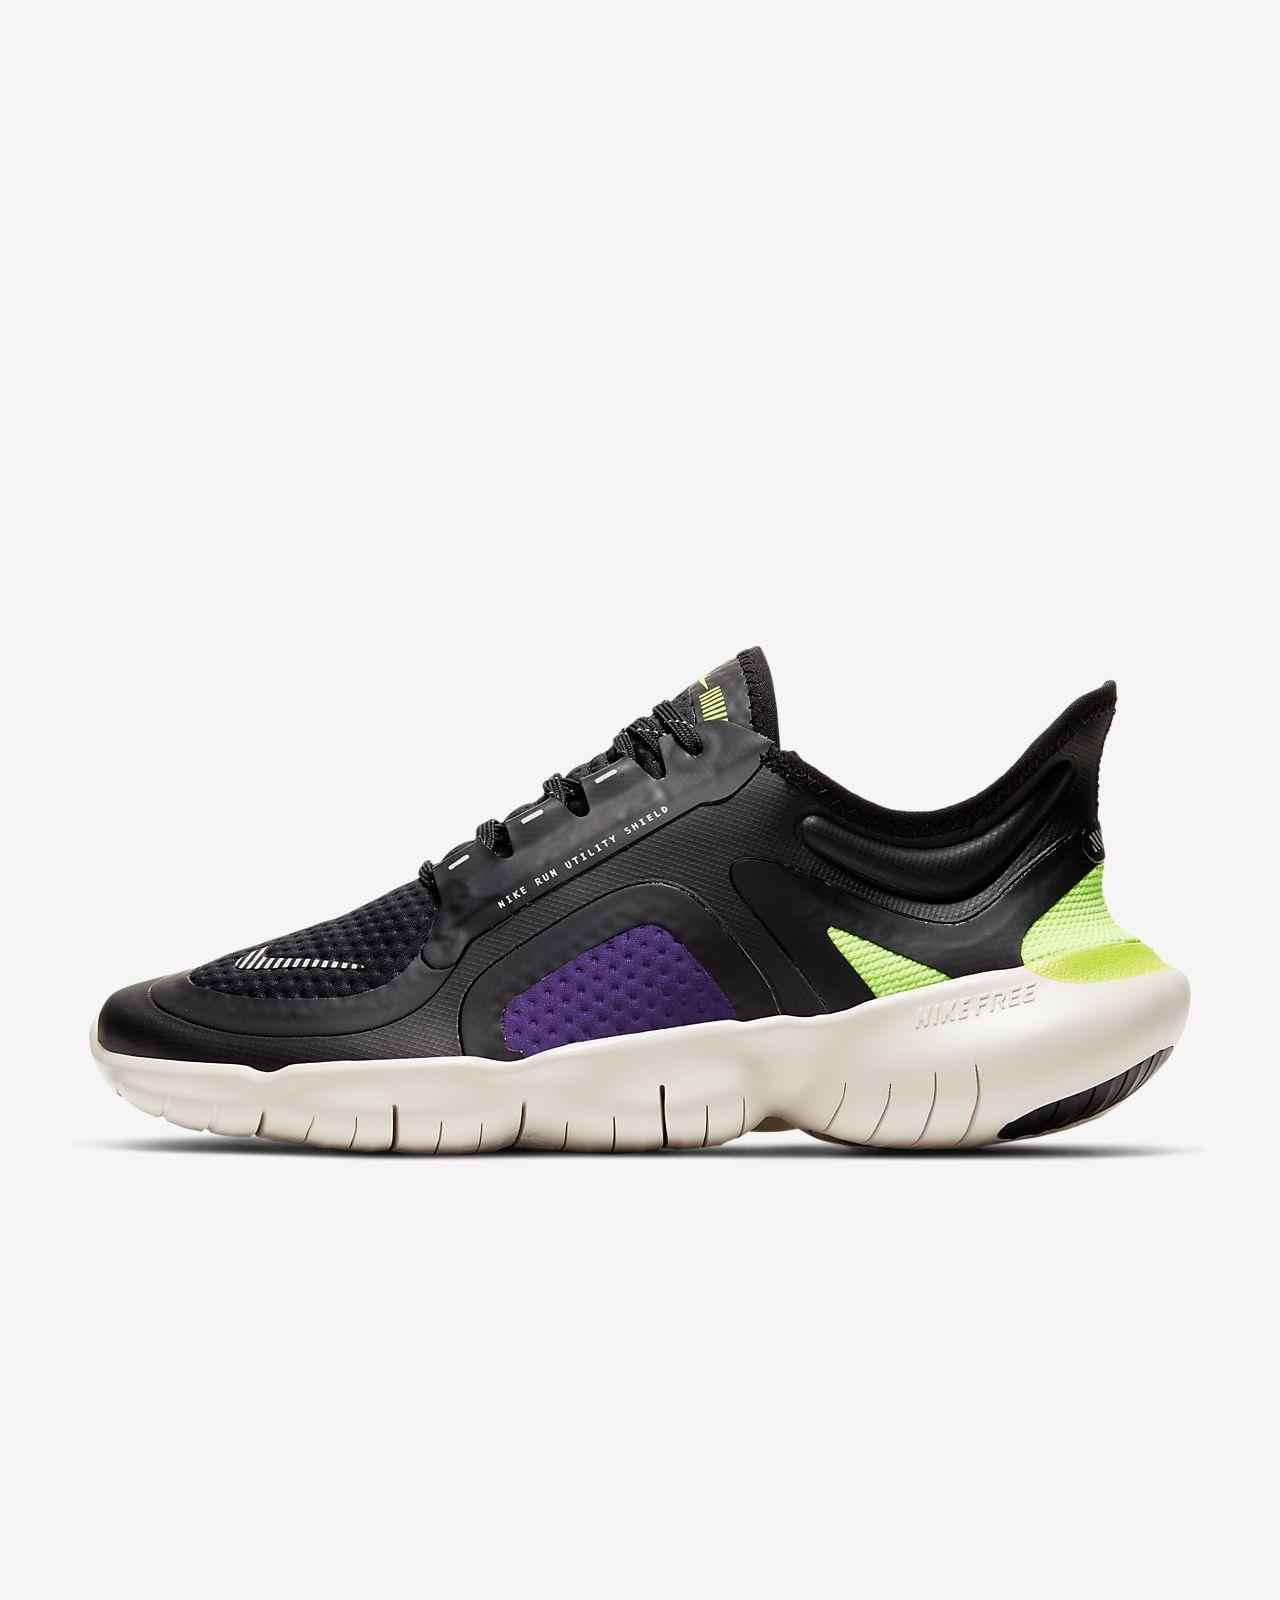 Calzado de running para mujer Nike Free RN 5.0 Shield